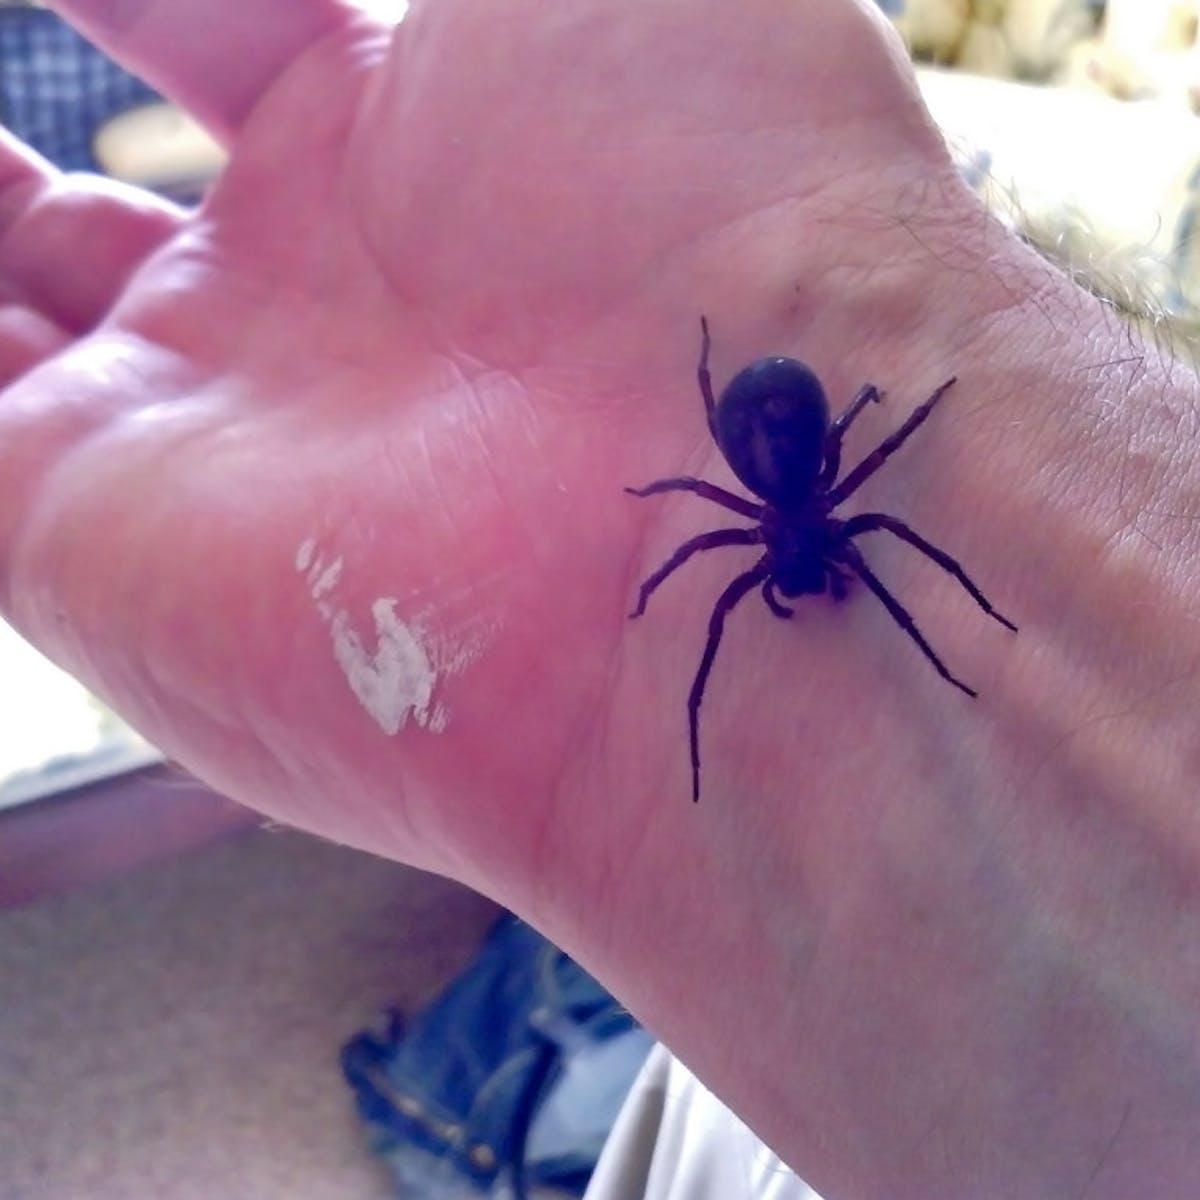 False Widow Death Was A Tragedy But It Wasn T Spider Venom That Was To Blame